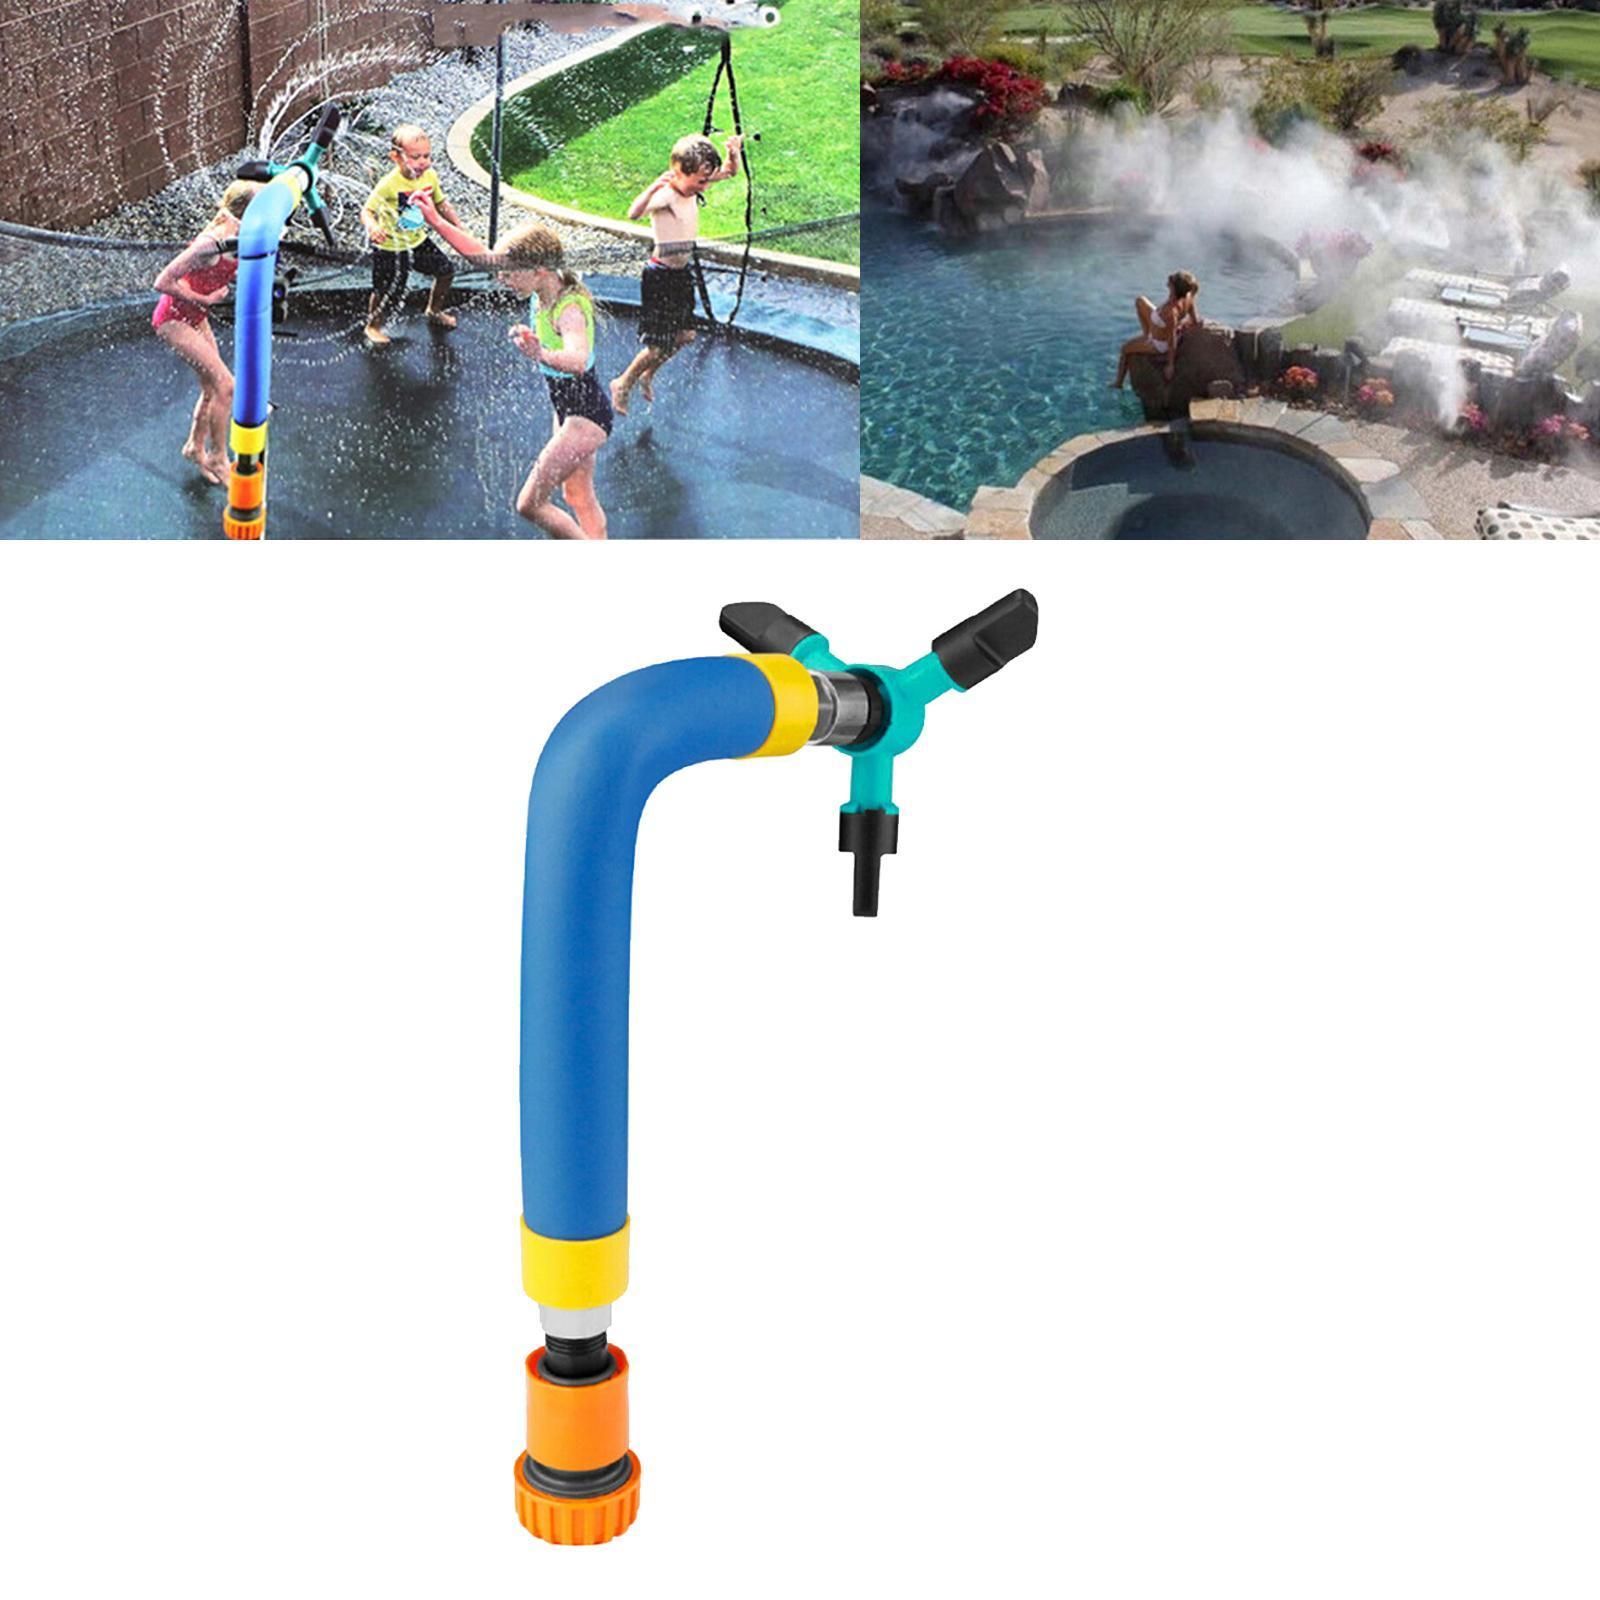 miniatura 5 - Trampolino di Acqua Sprinkler A Spruzzo Nebbia Giardino Estate Giochi